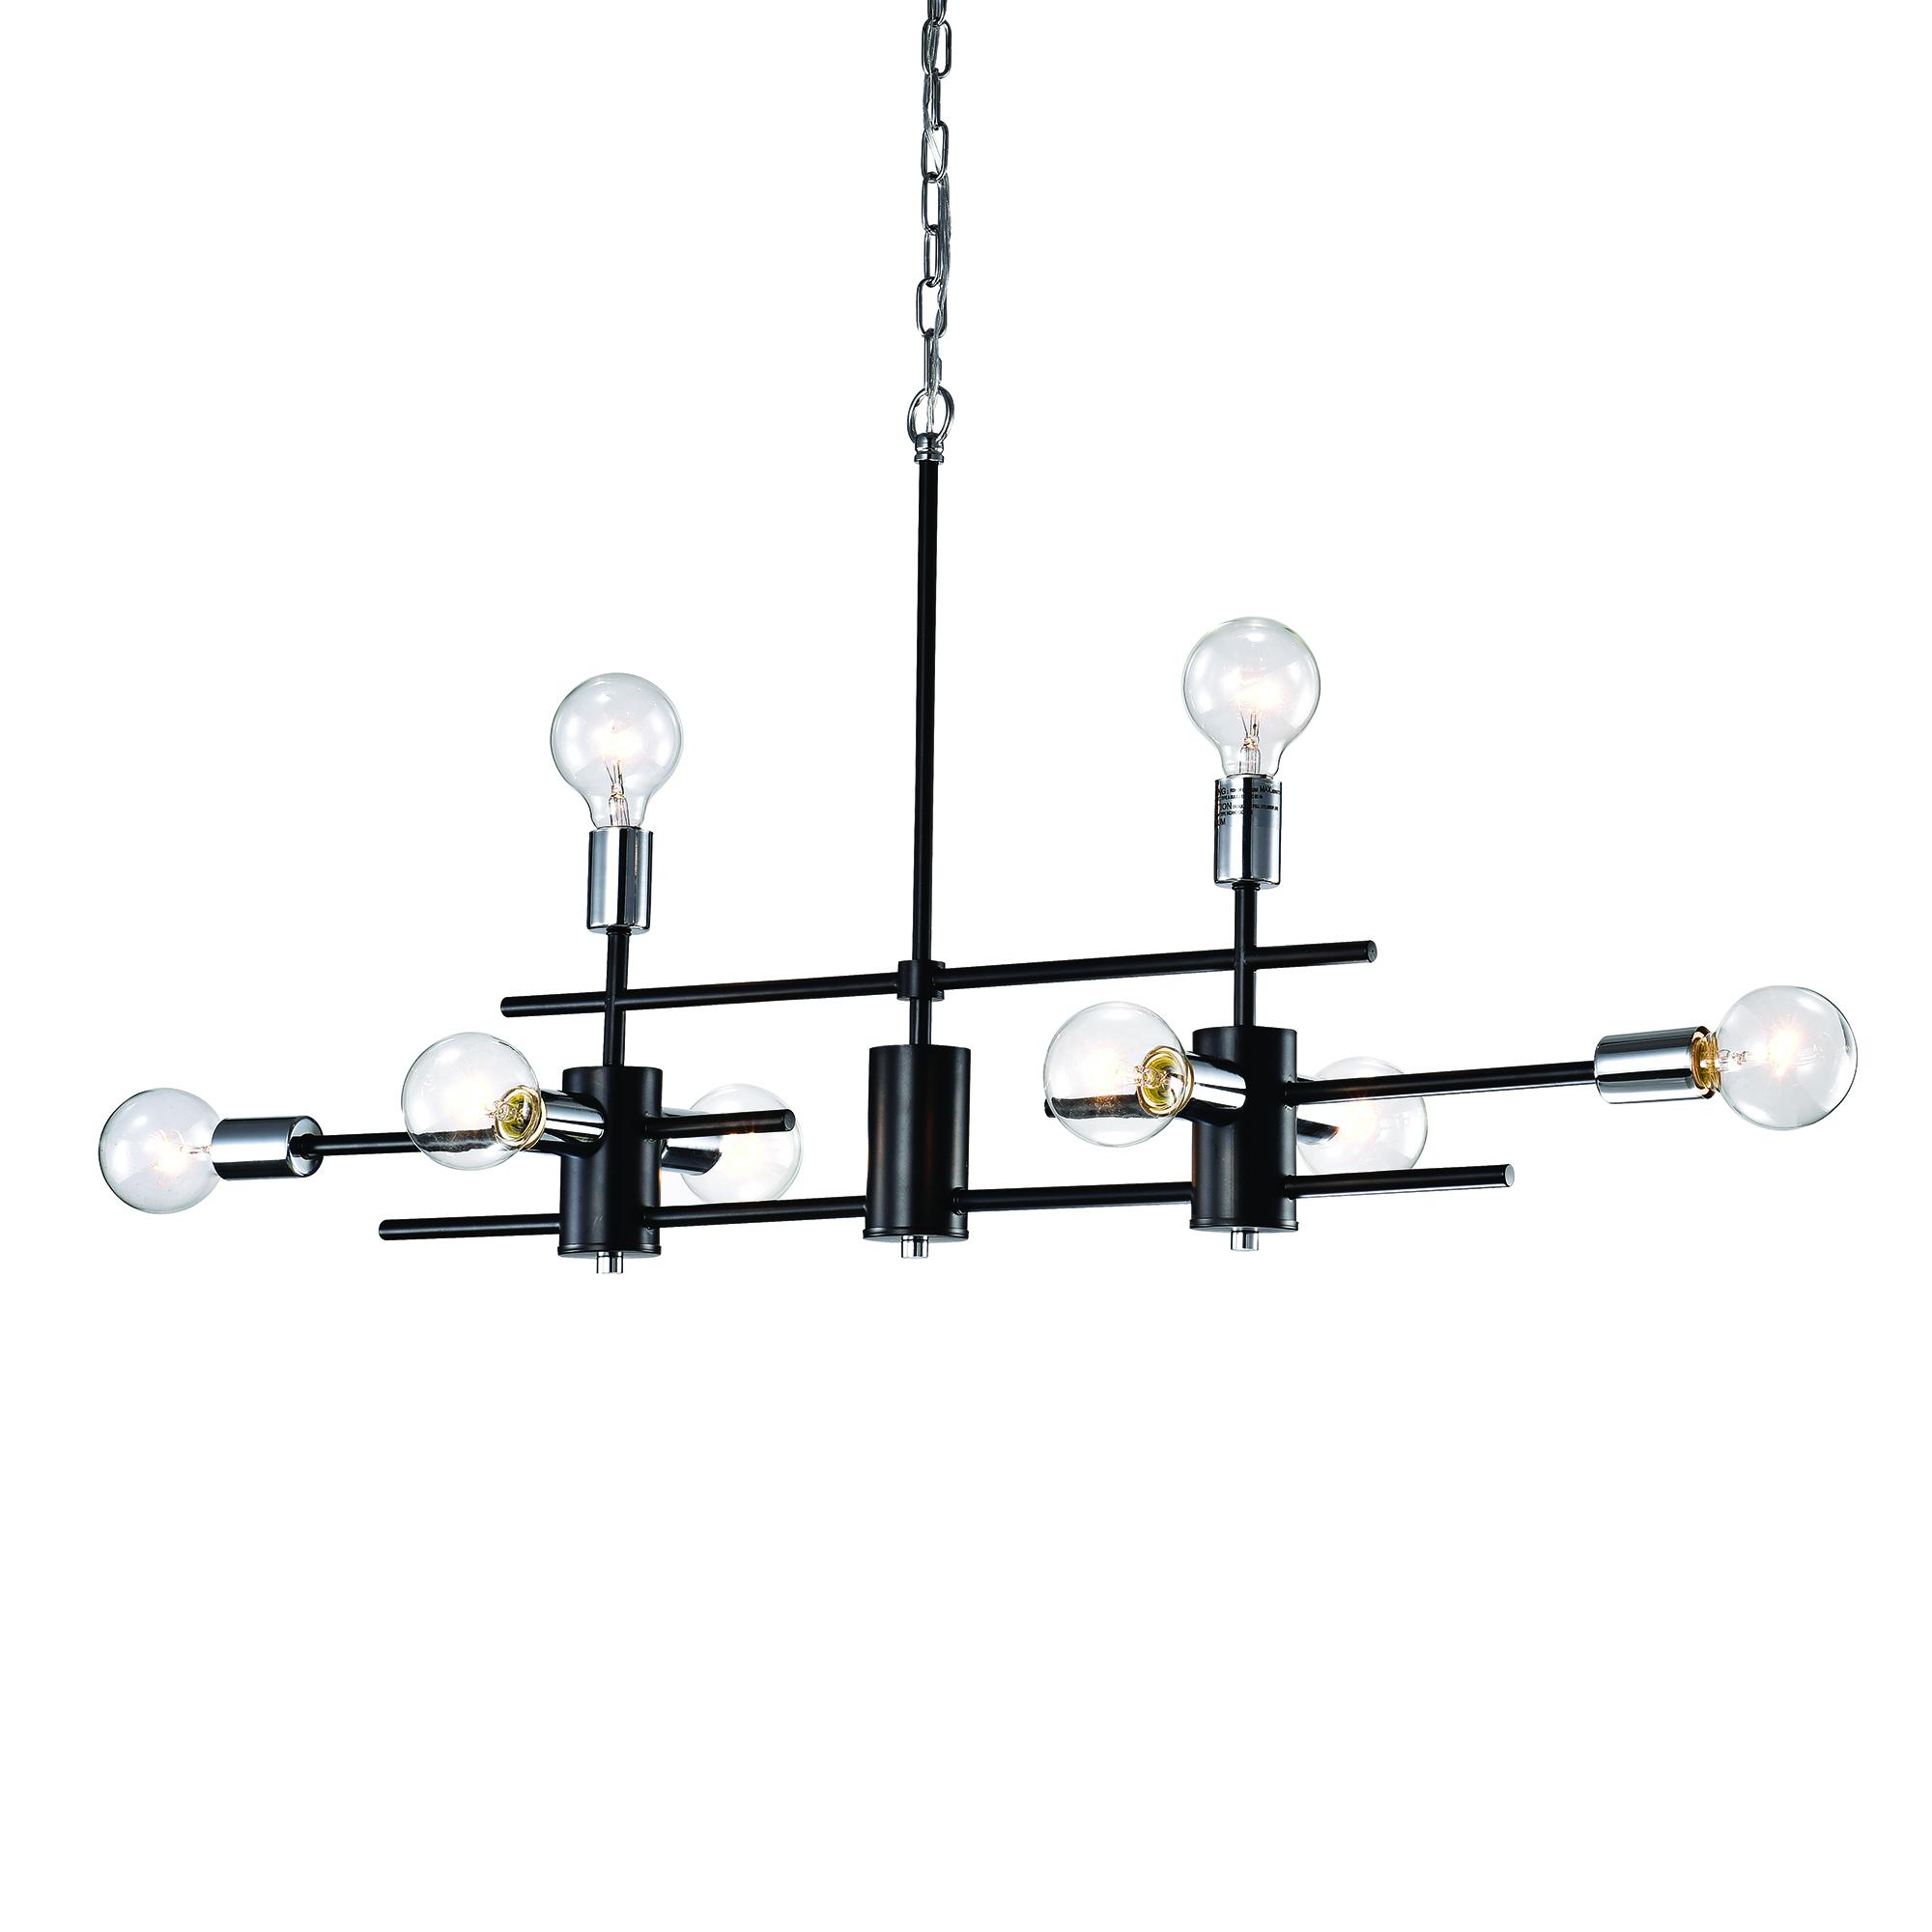 8 Light Black And Chrome Exposed Bulb Linear Chandelier